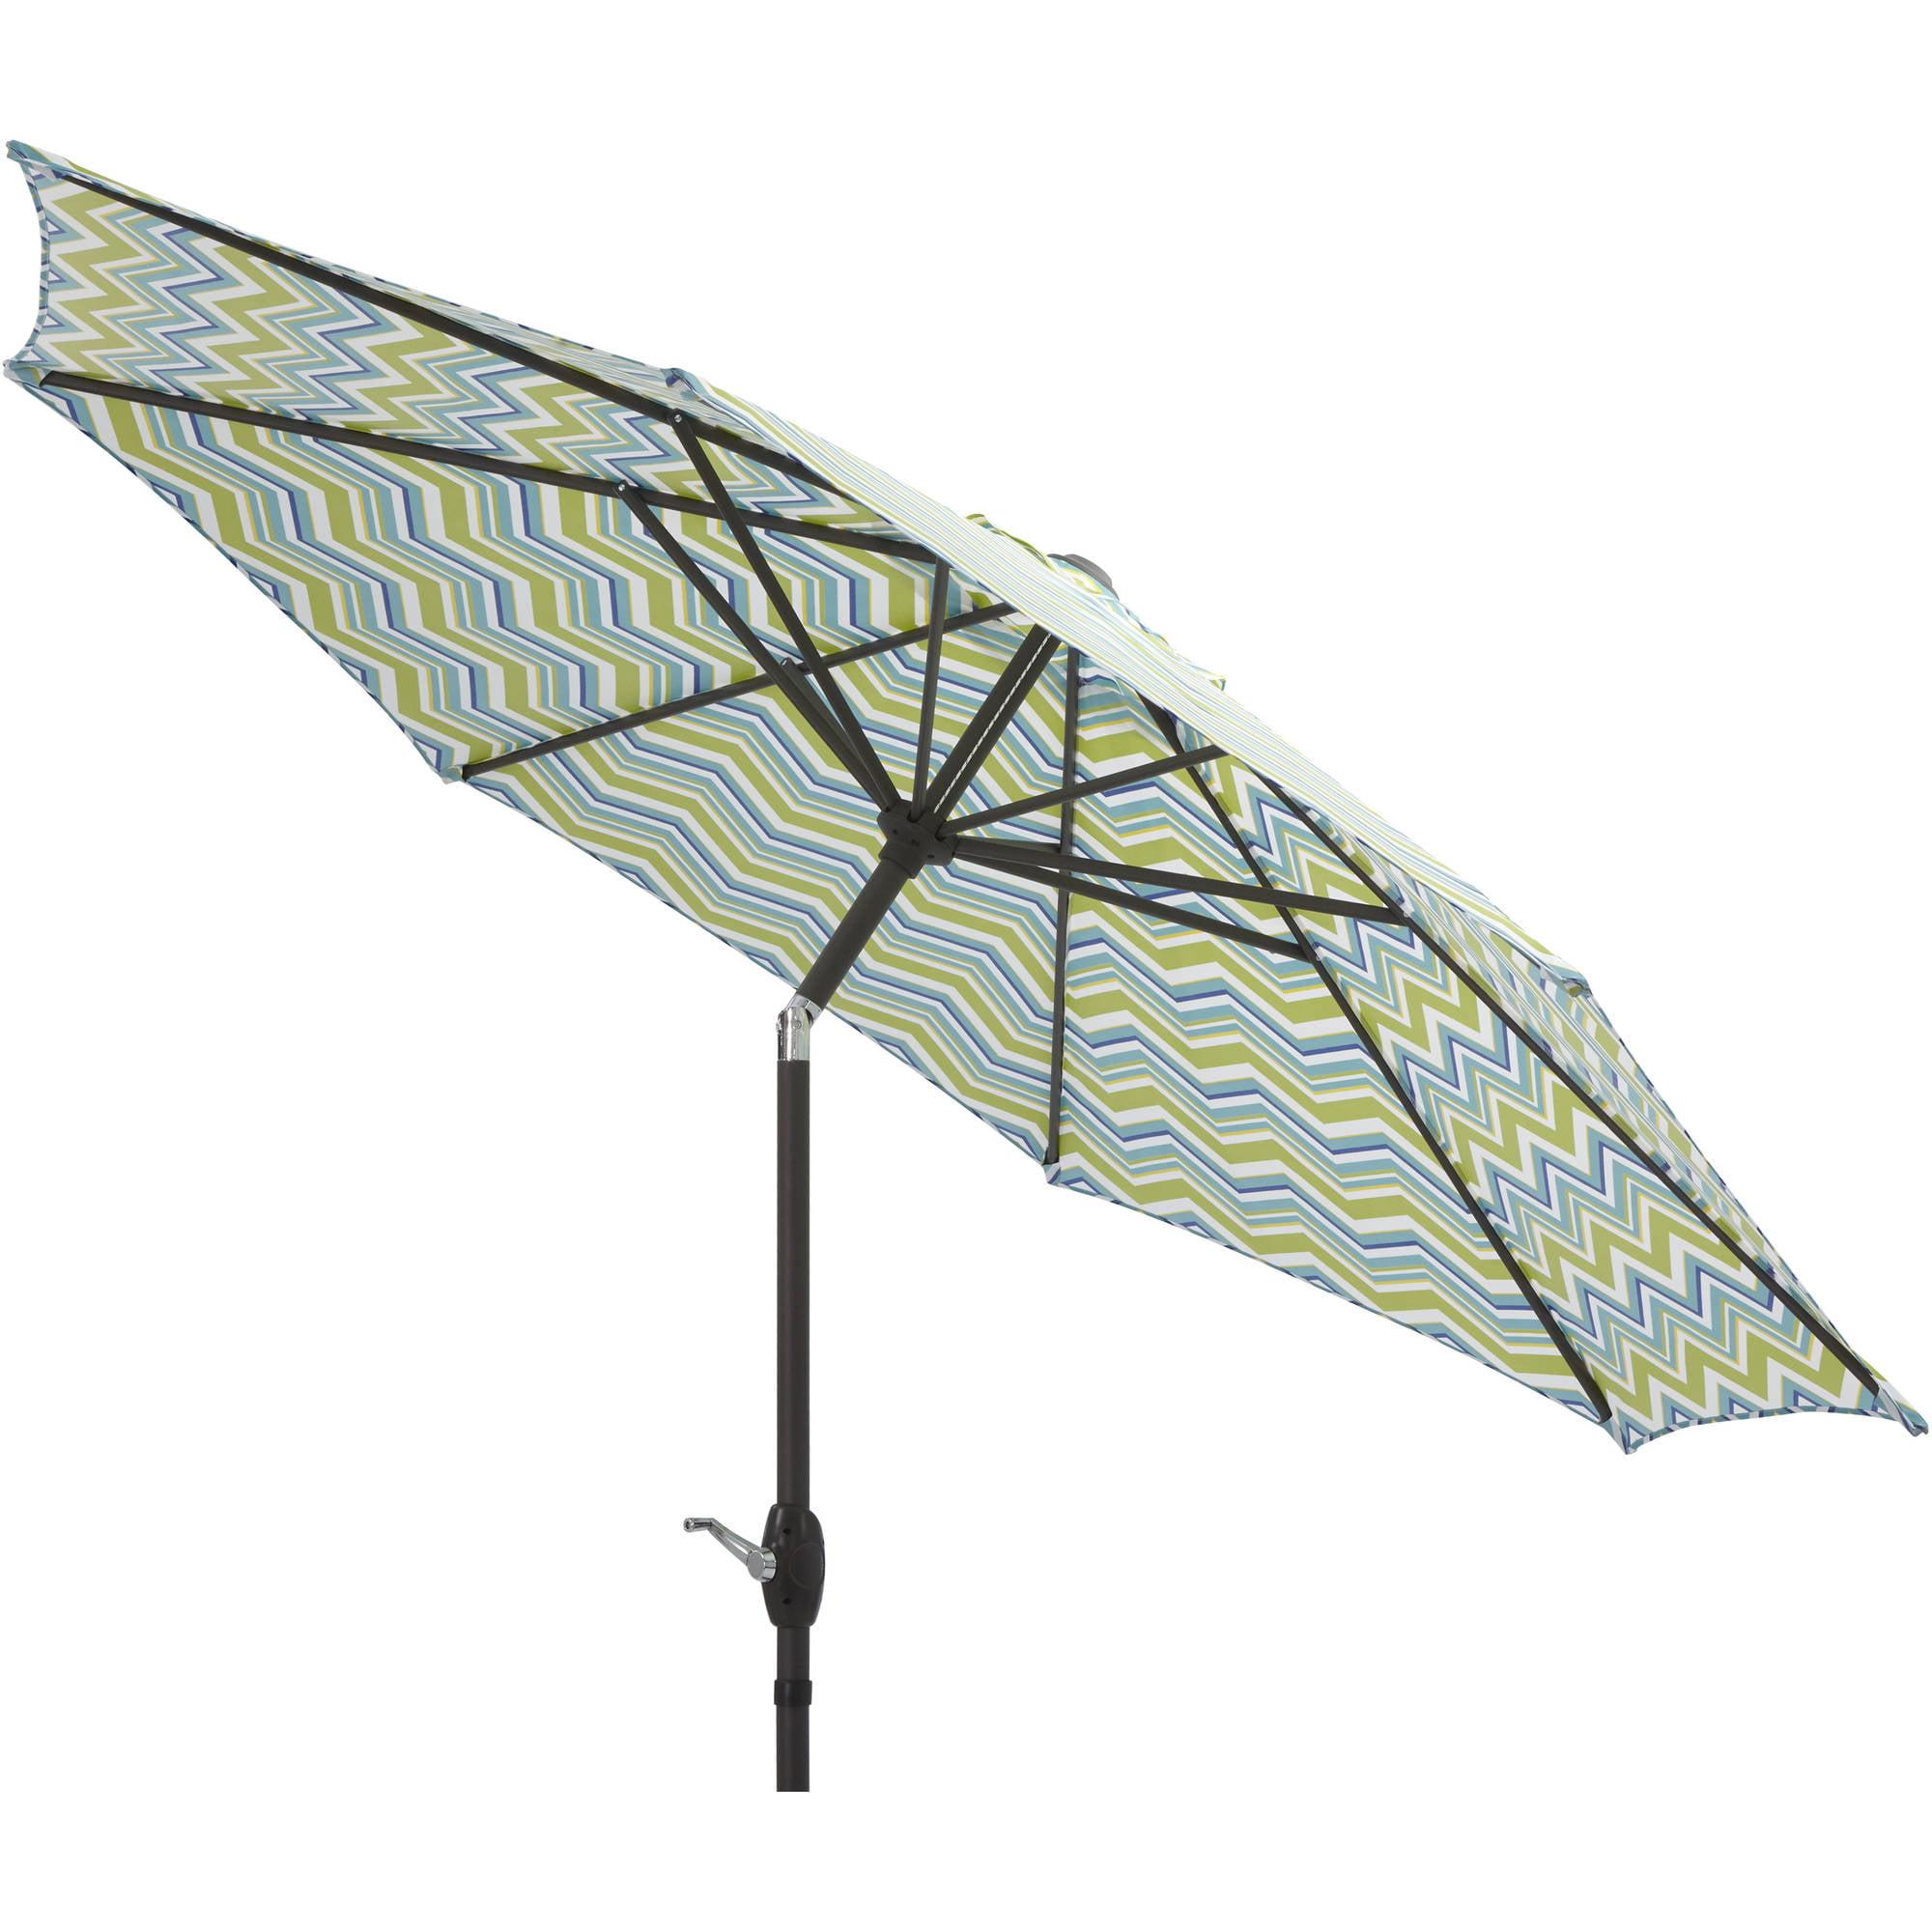 Mainstays 9' Market Umbrella, Miranda Chevron with Brown Frame by